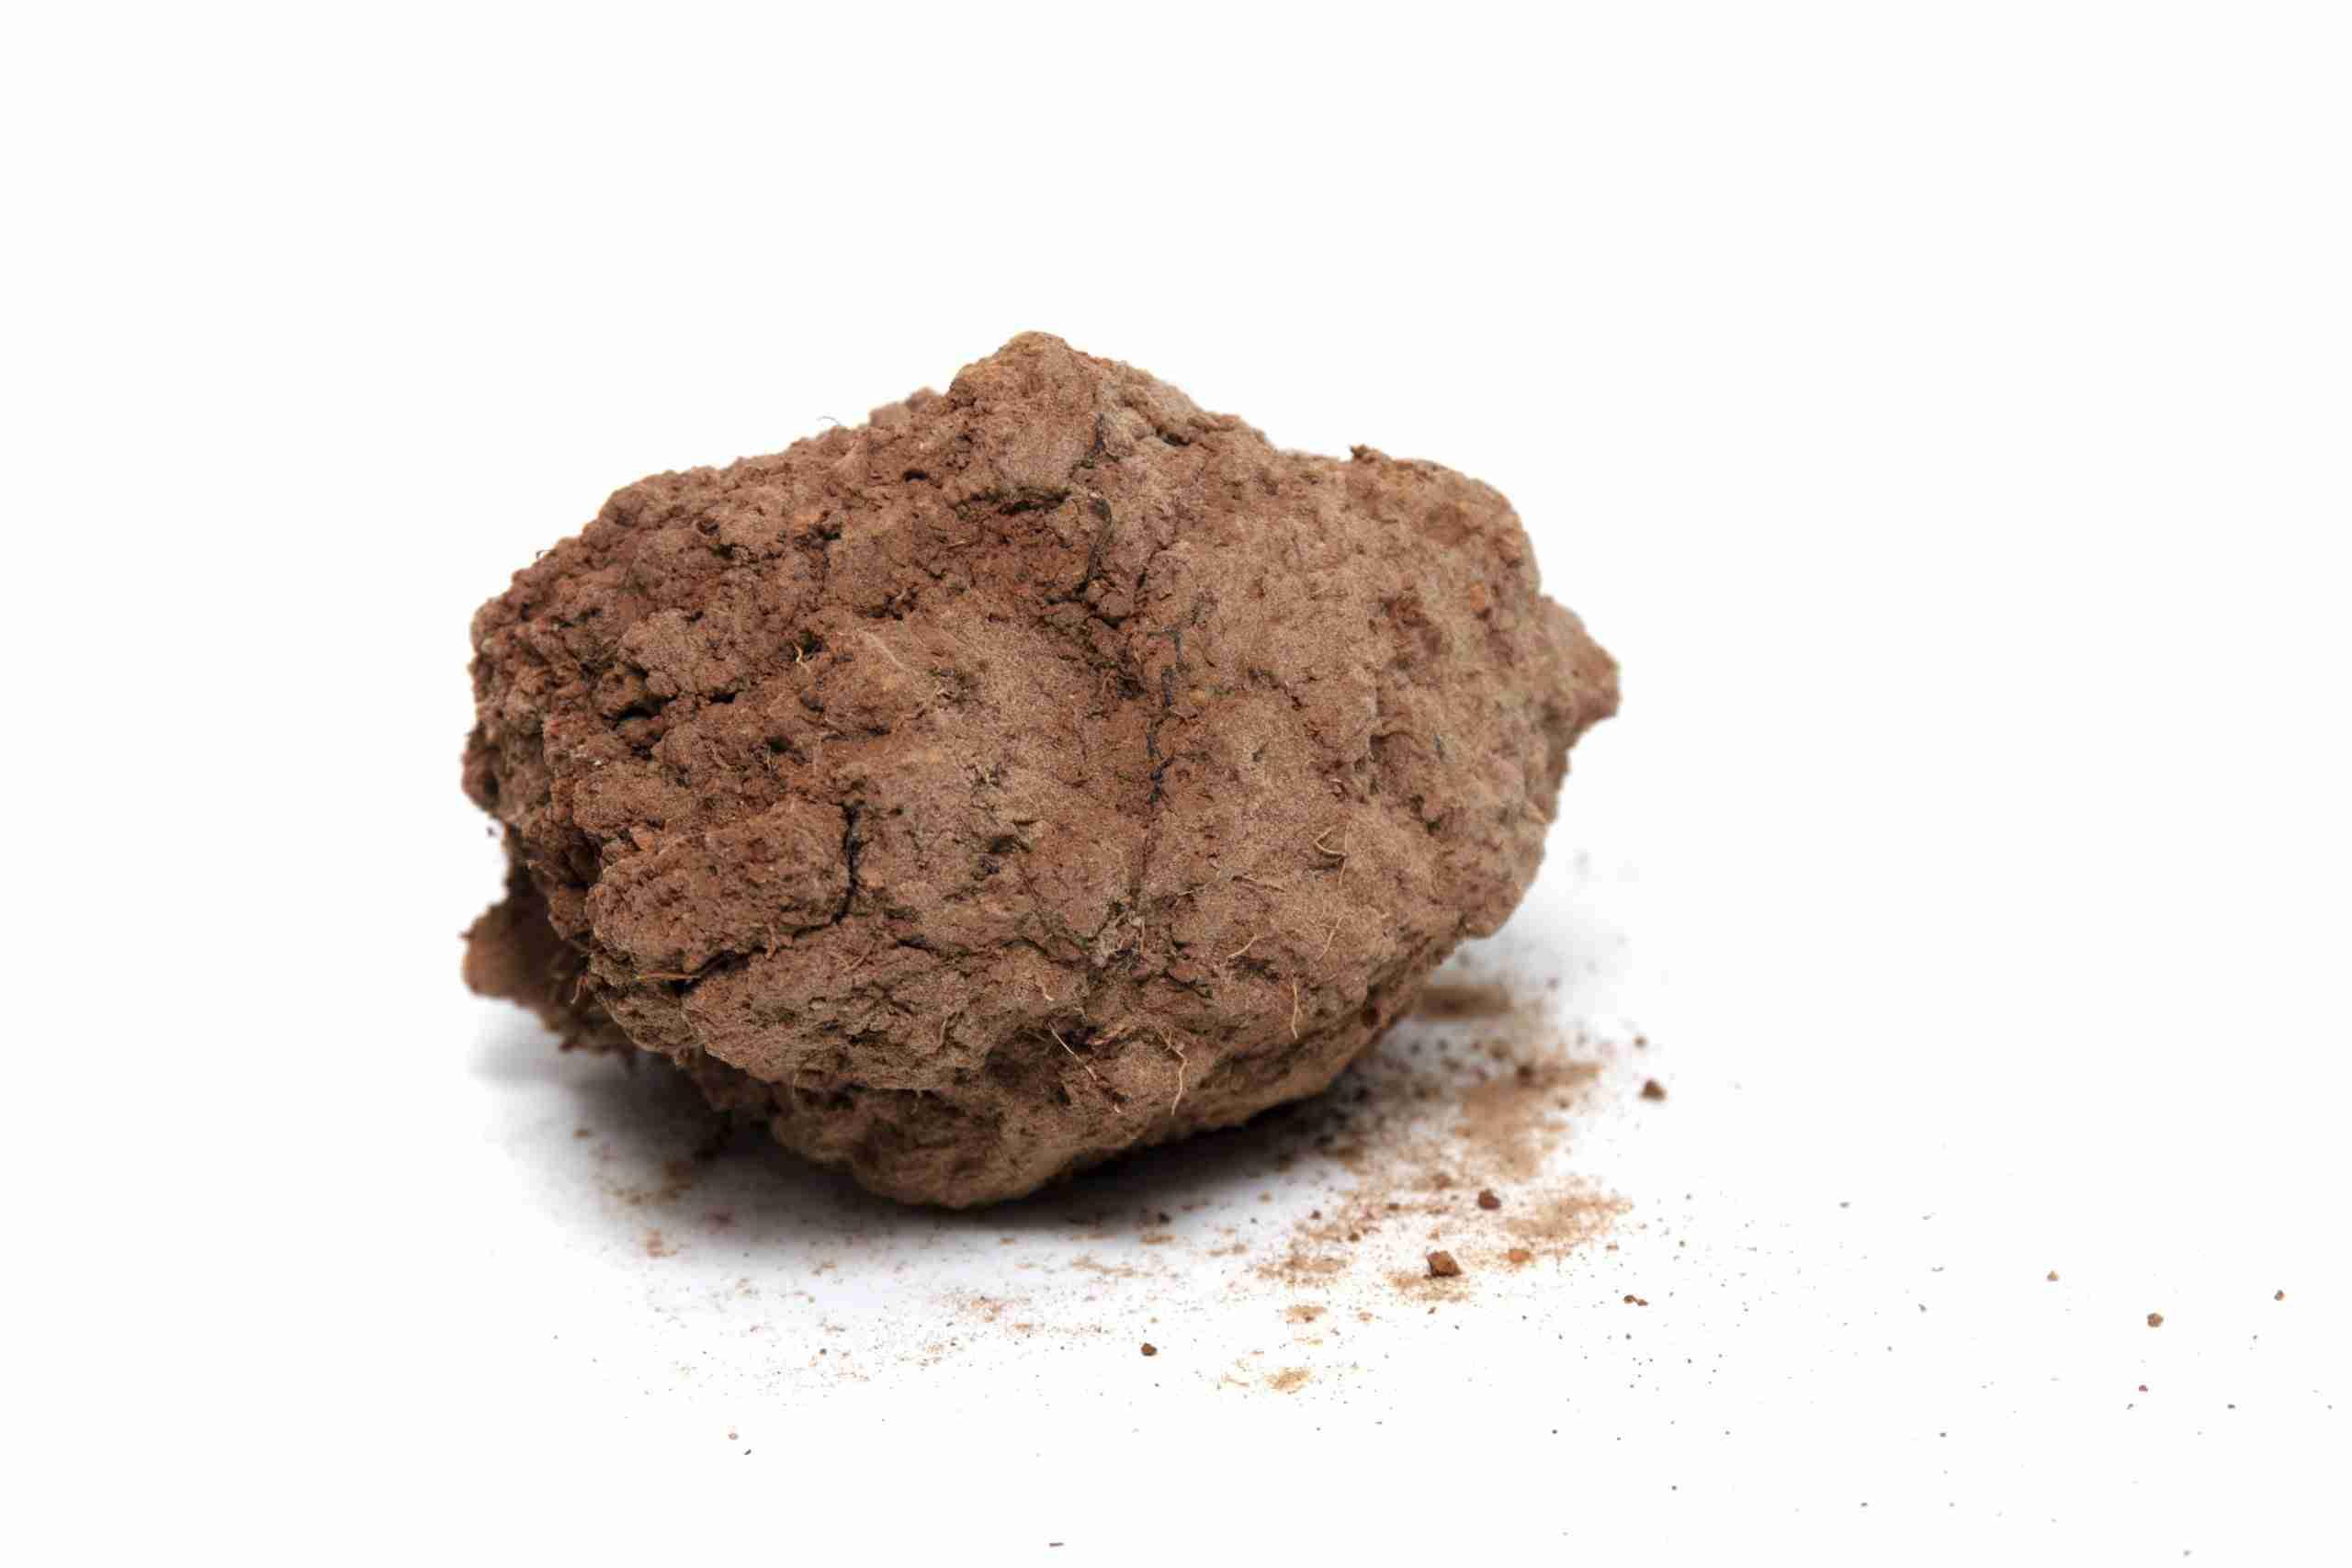 untreated dirt